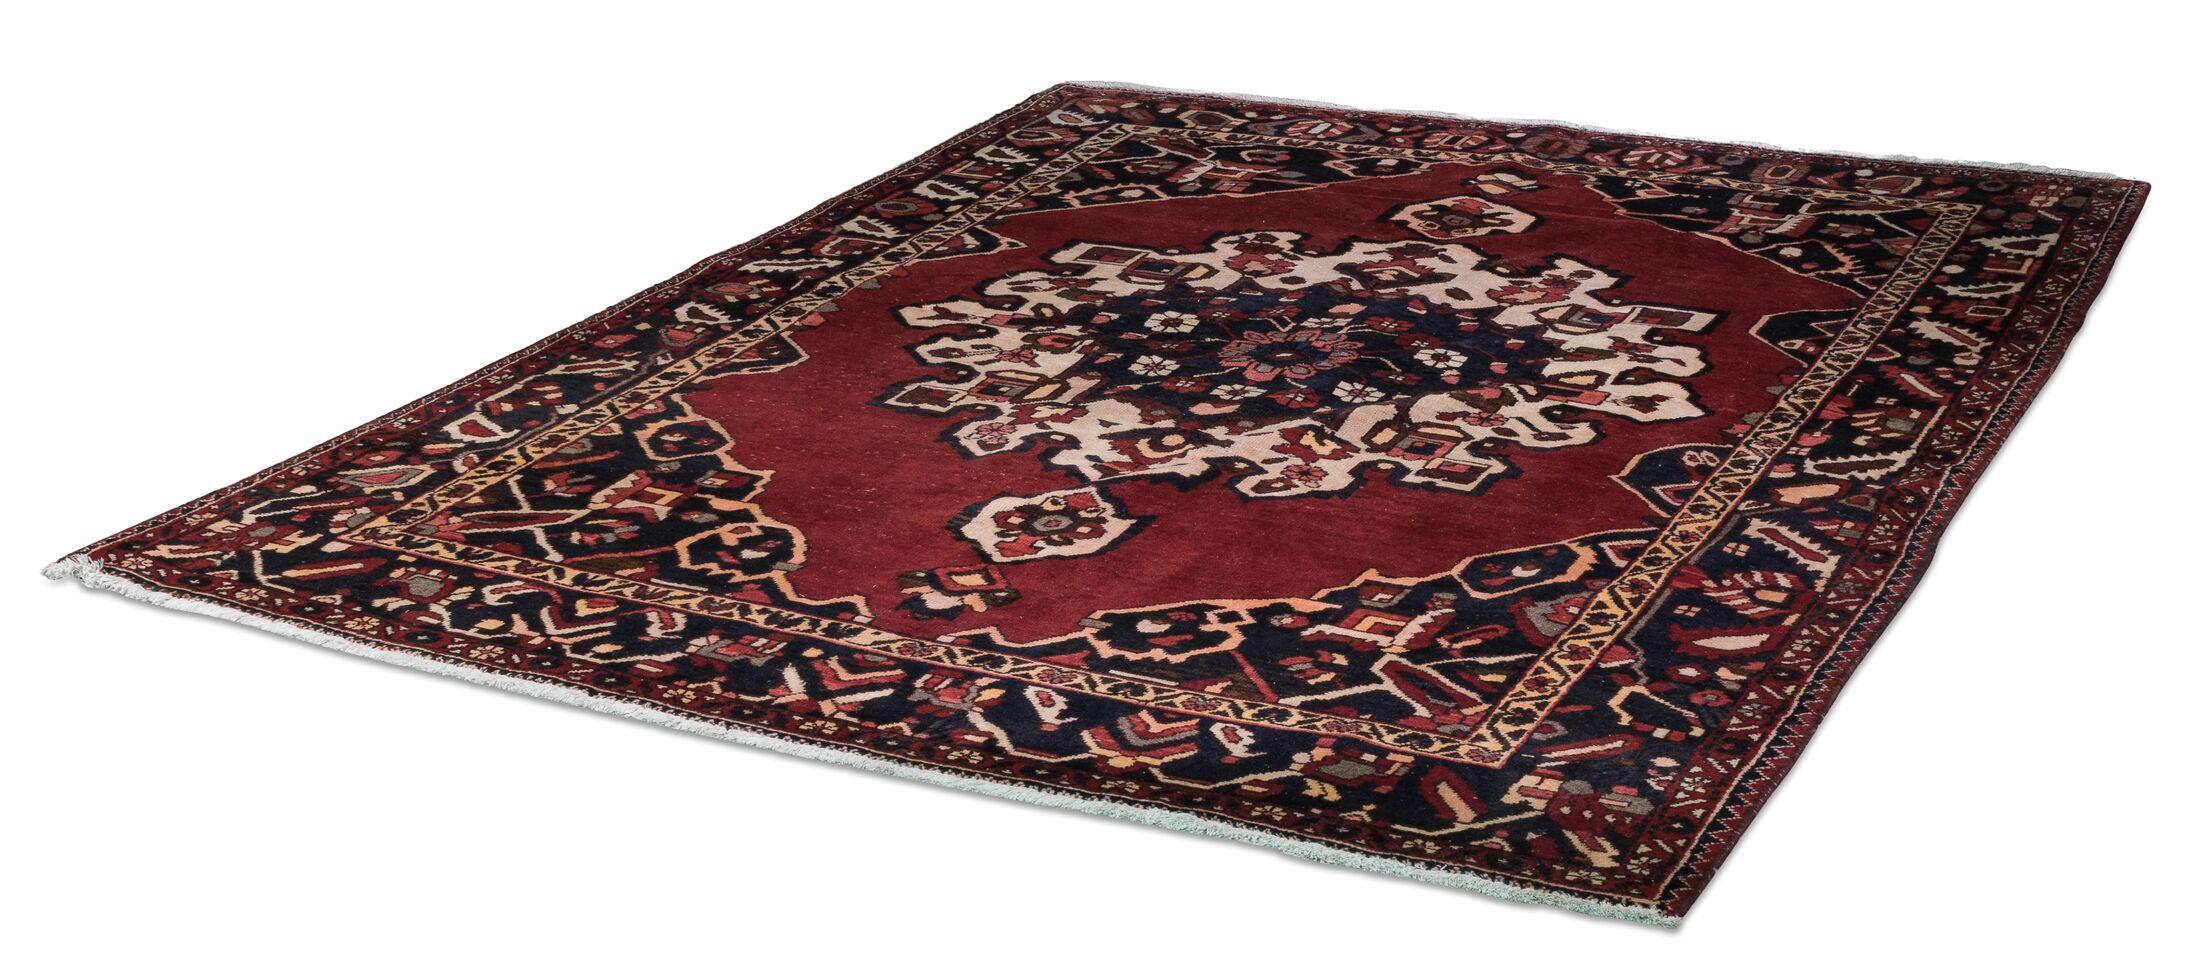 Persian Baktiak Hand Woven Red/Black Area Rug